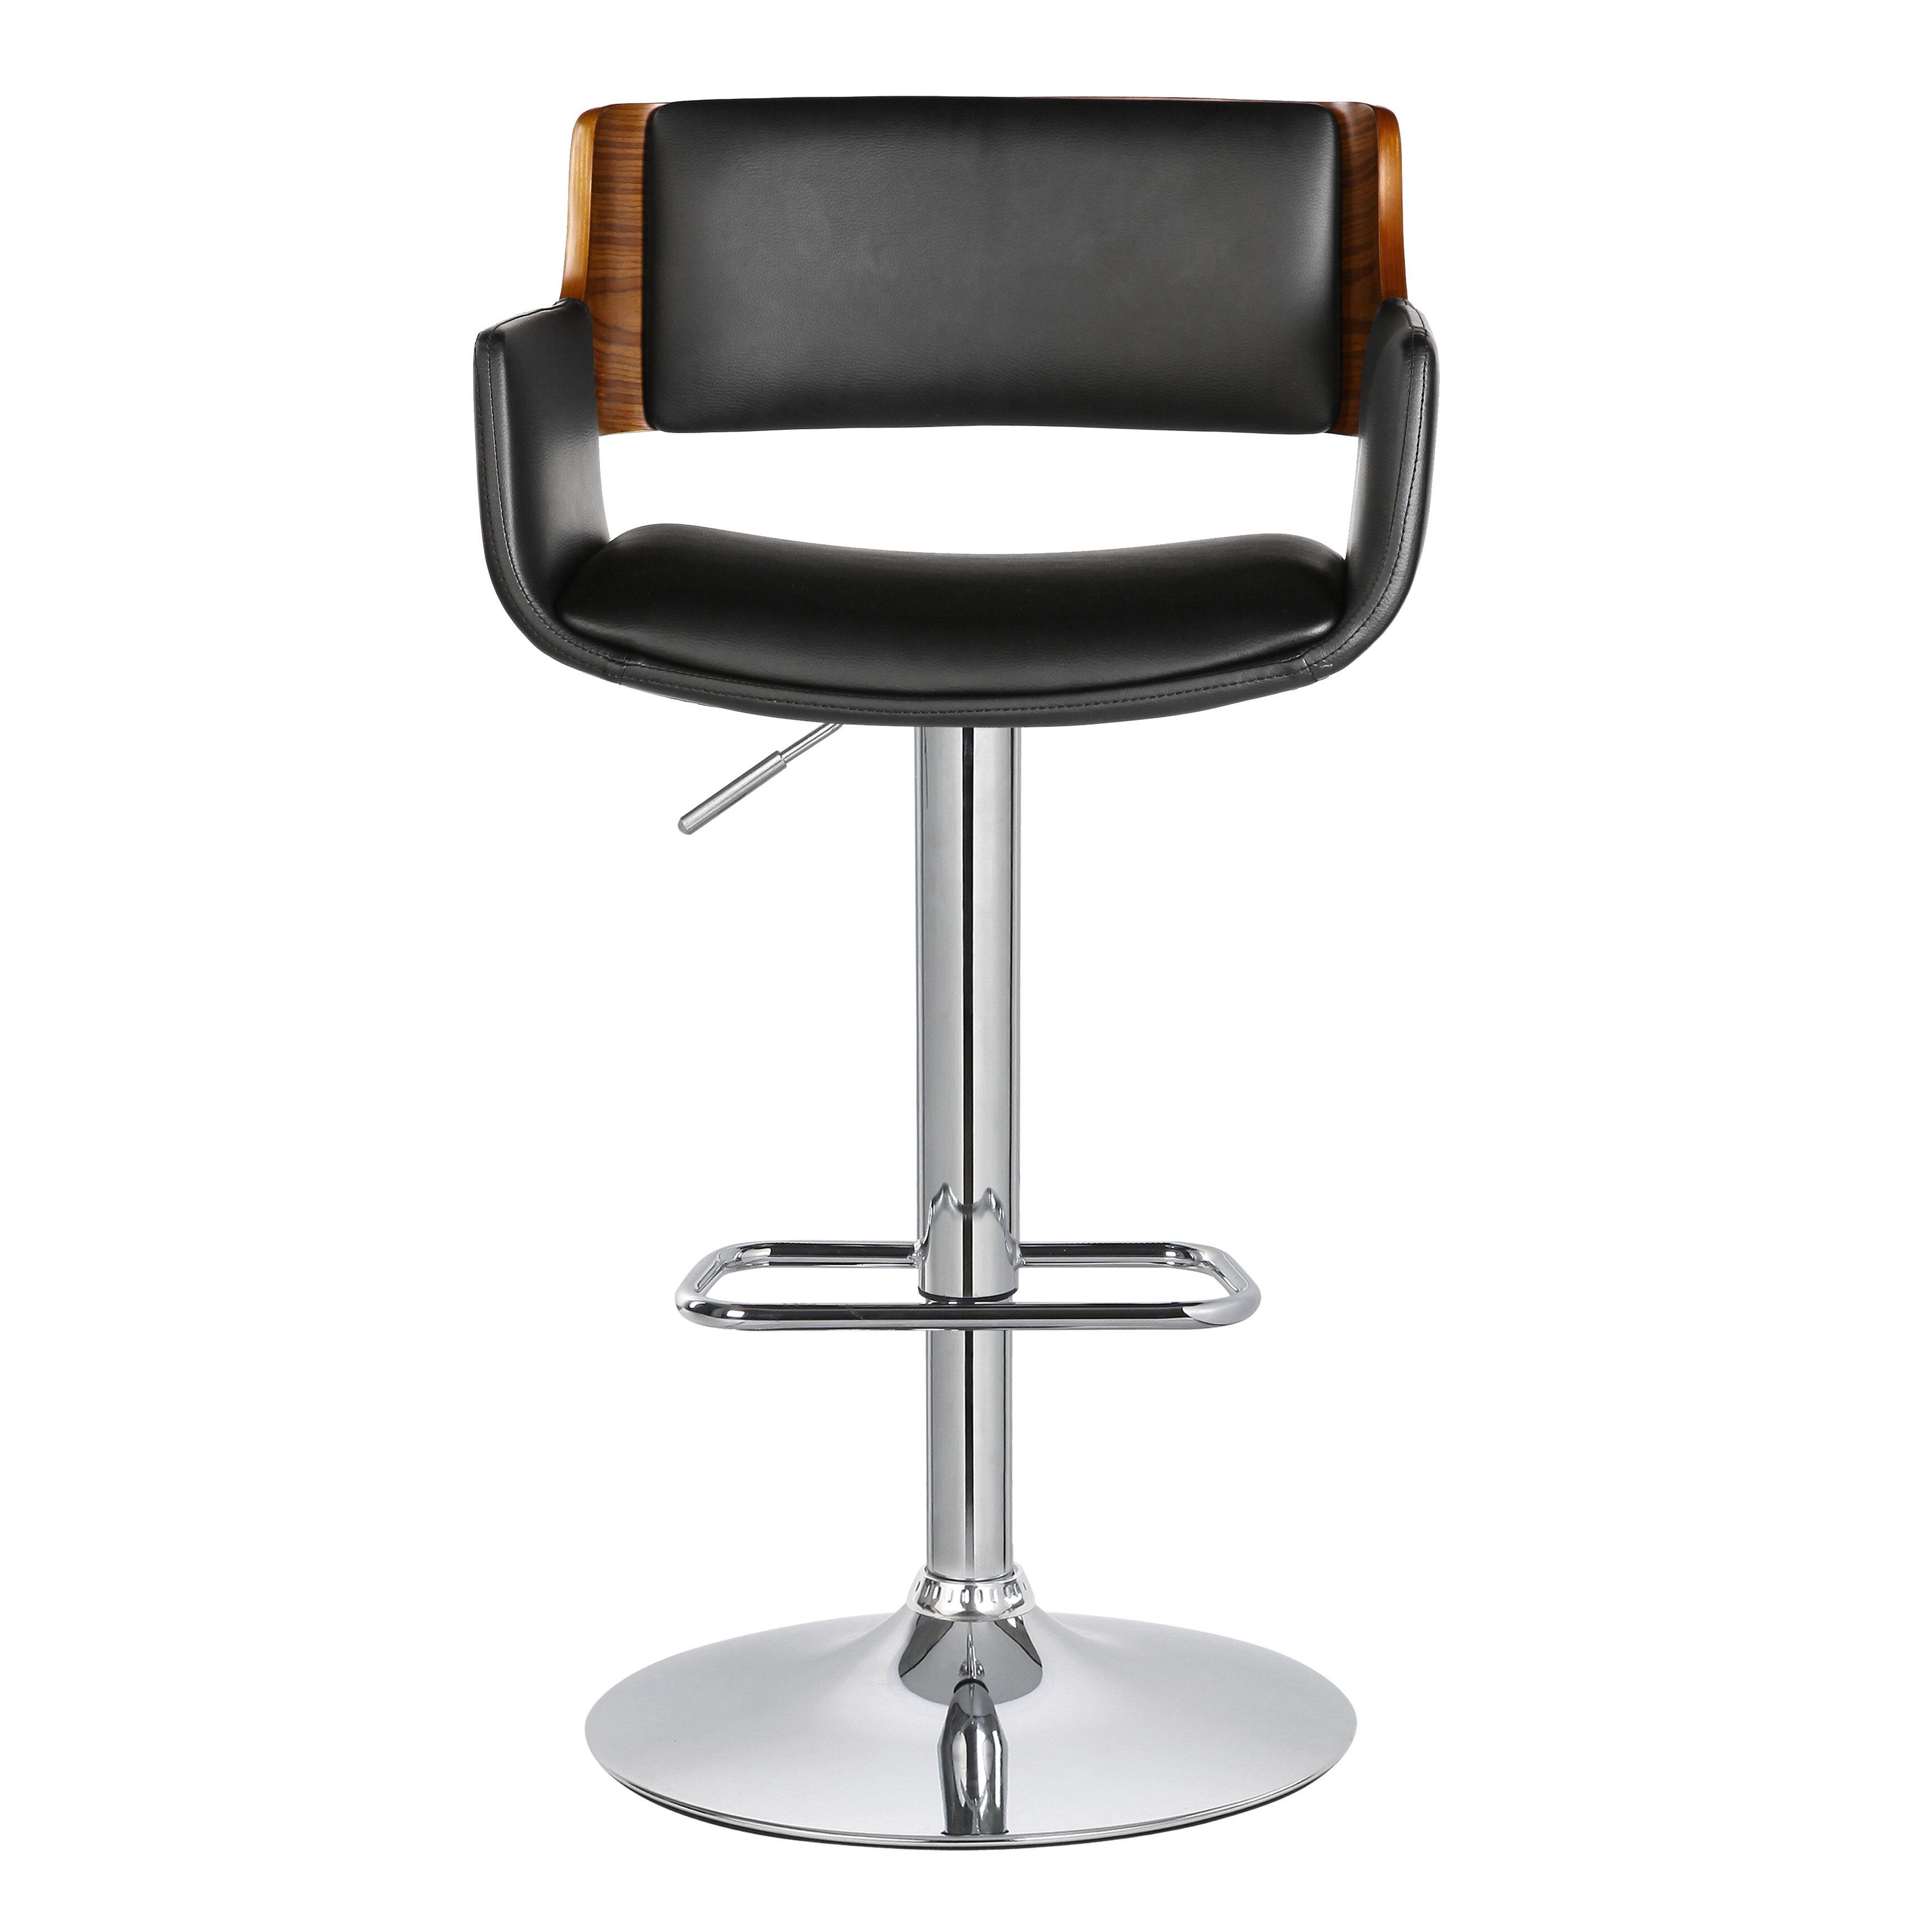 Tremendous Corena 33 Swivel Bar Stool Ibusinesslaw Wood Chair Design Ideas Ibusinesslaworg